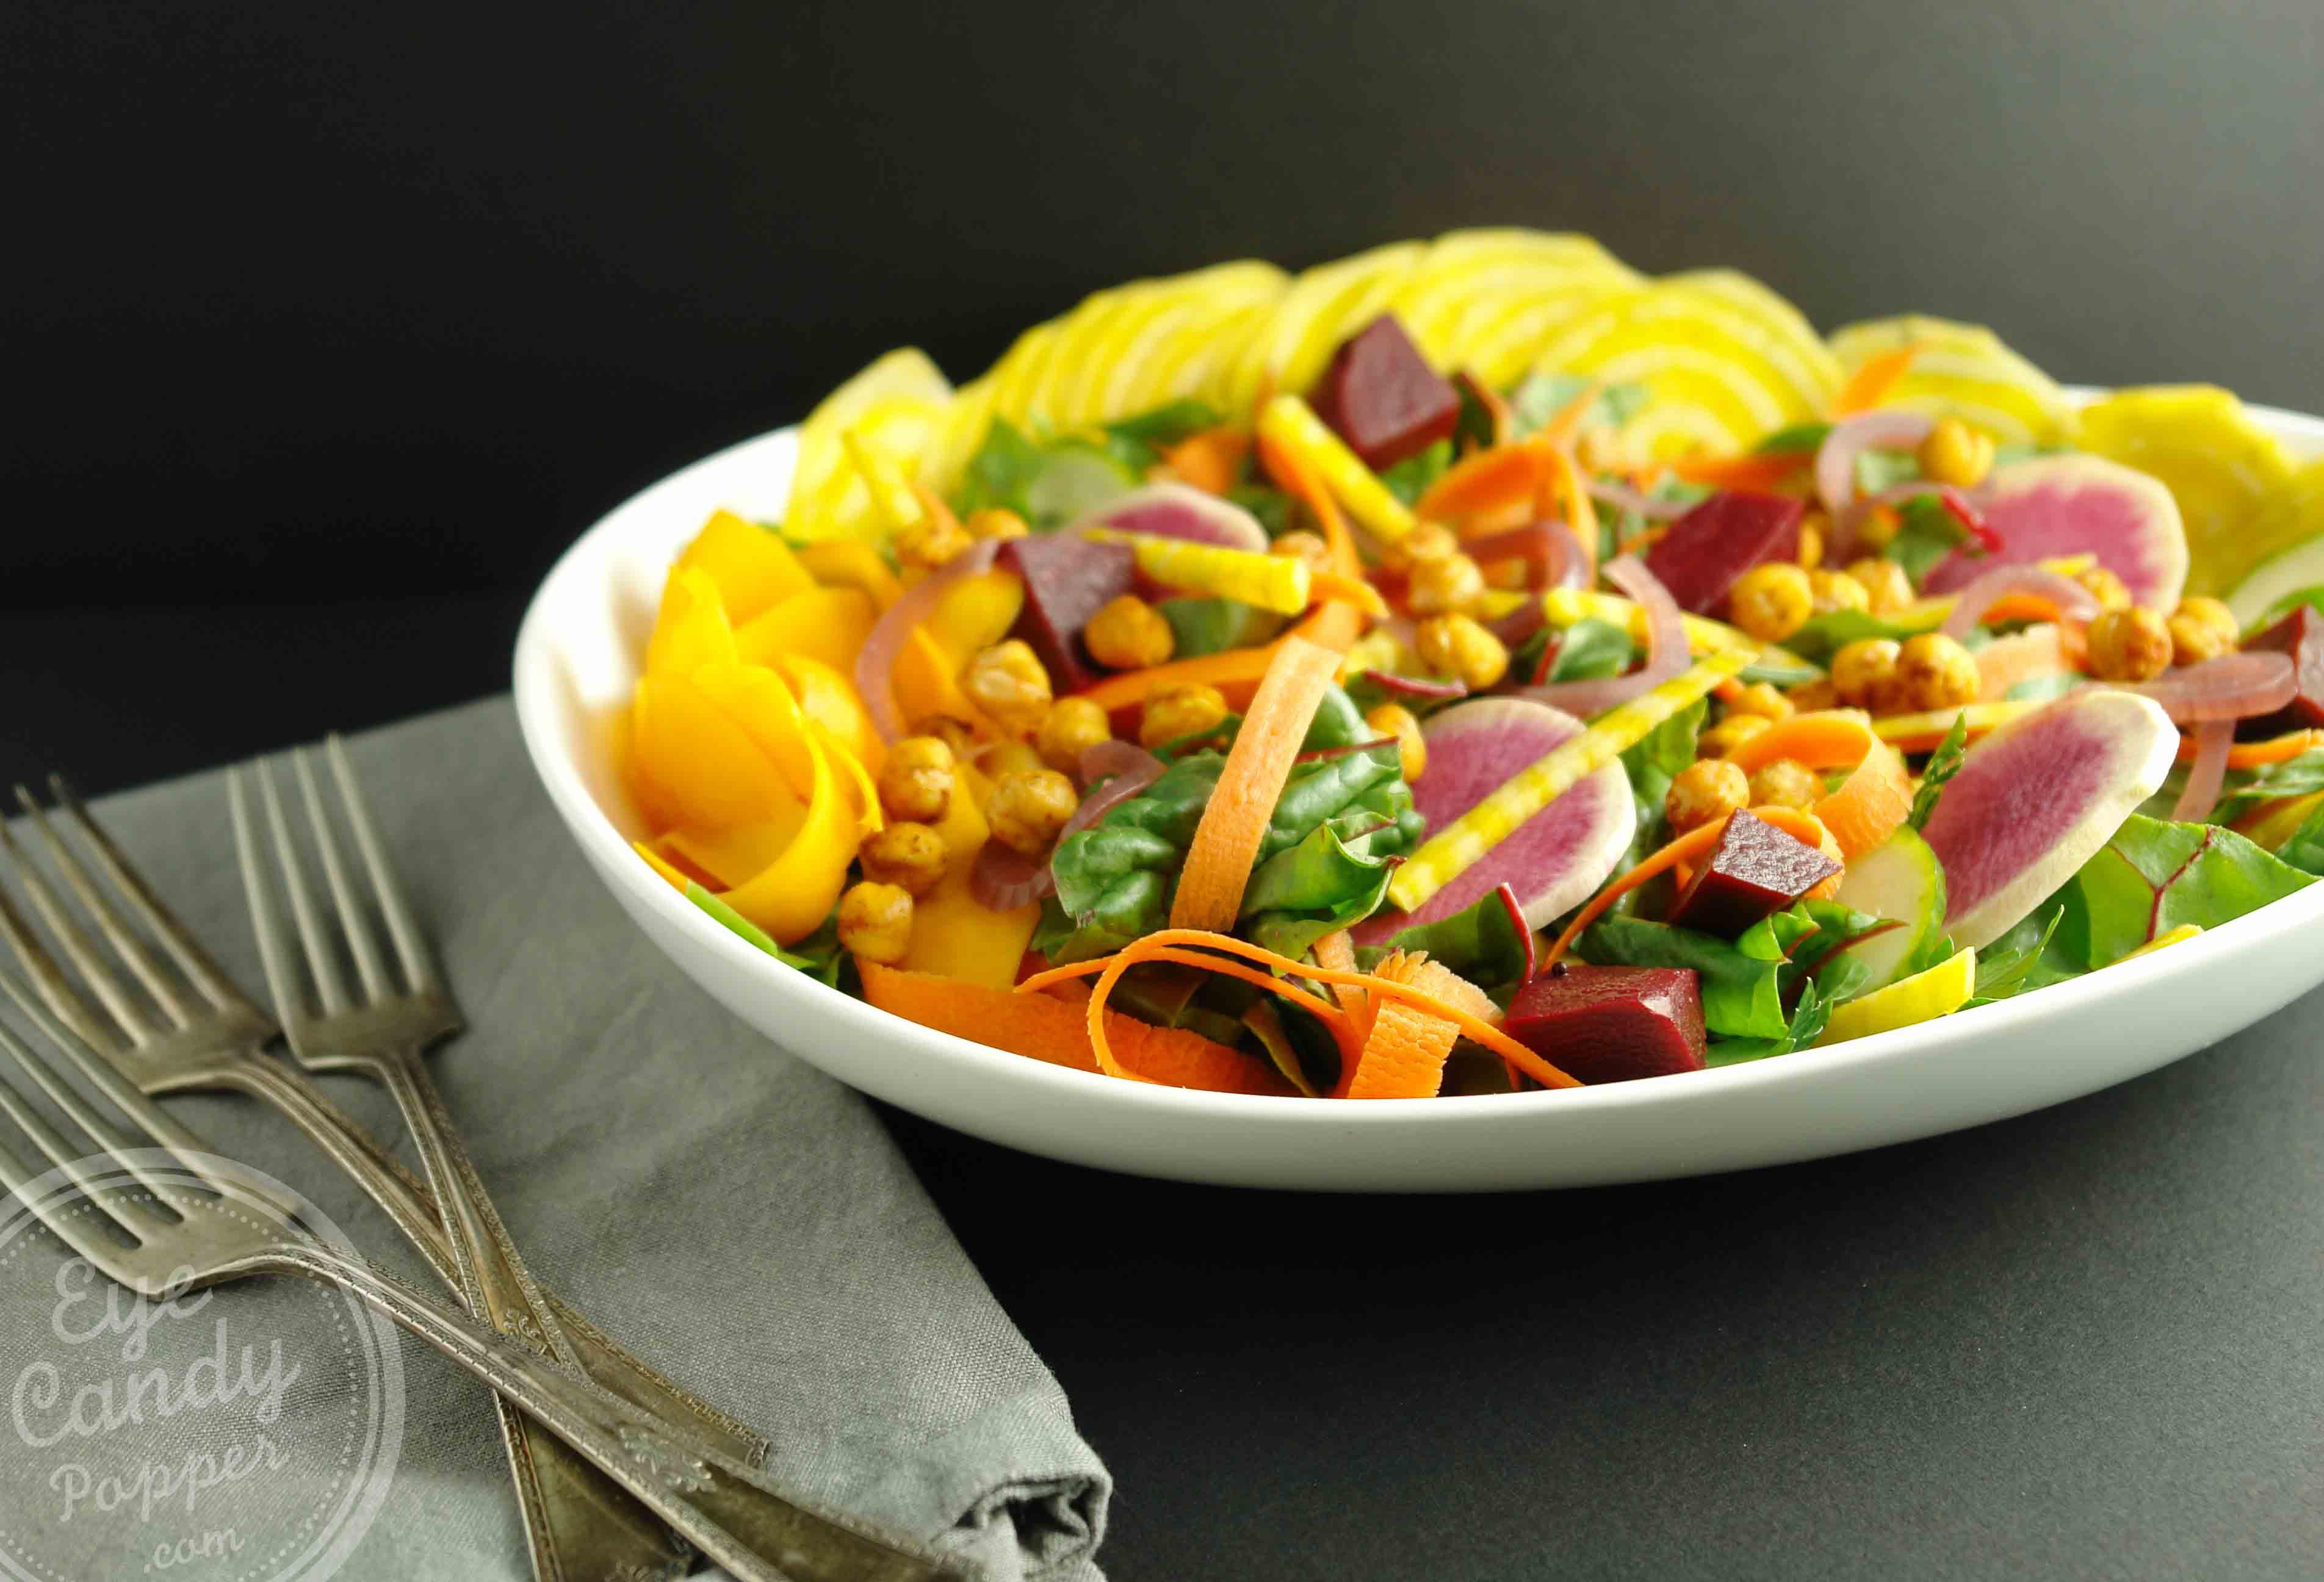 Fall Veggie Salad With Chickpea Croutons Vegan Gluten Free Paleo All Vegetarian